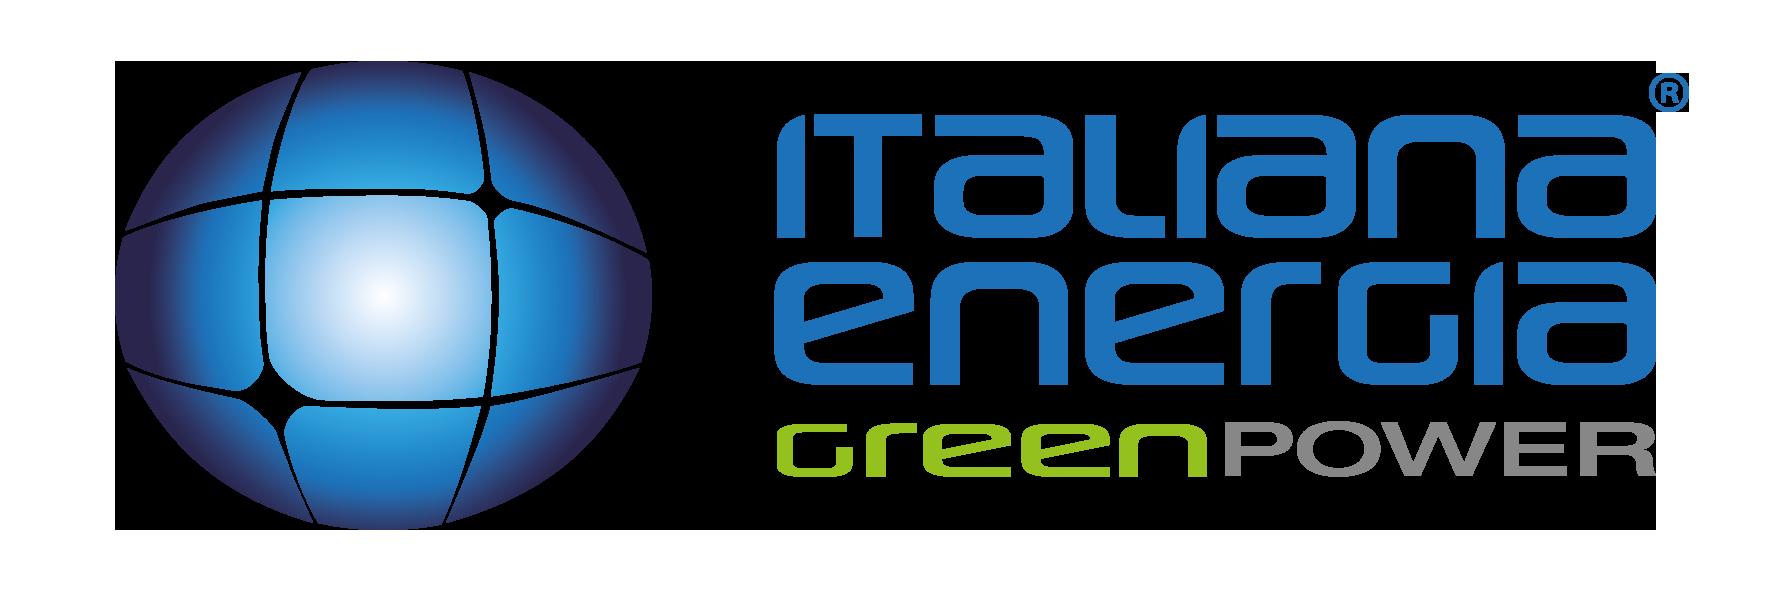 Italiana Energia